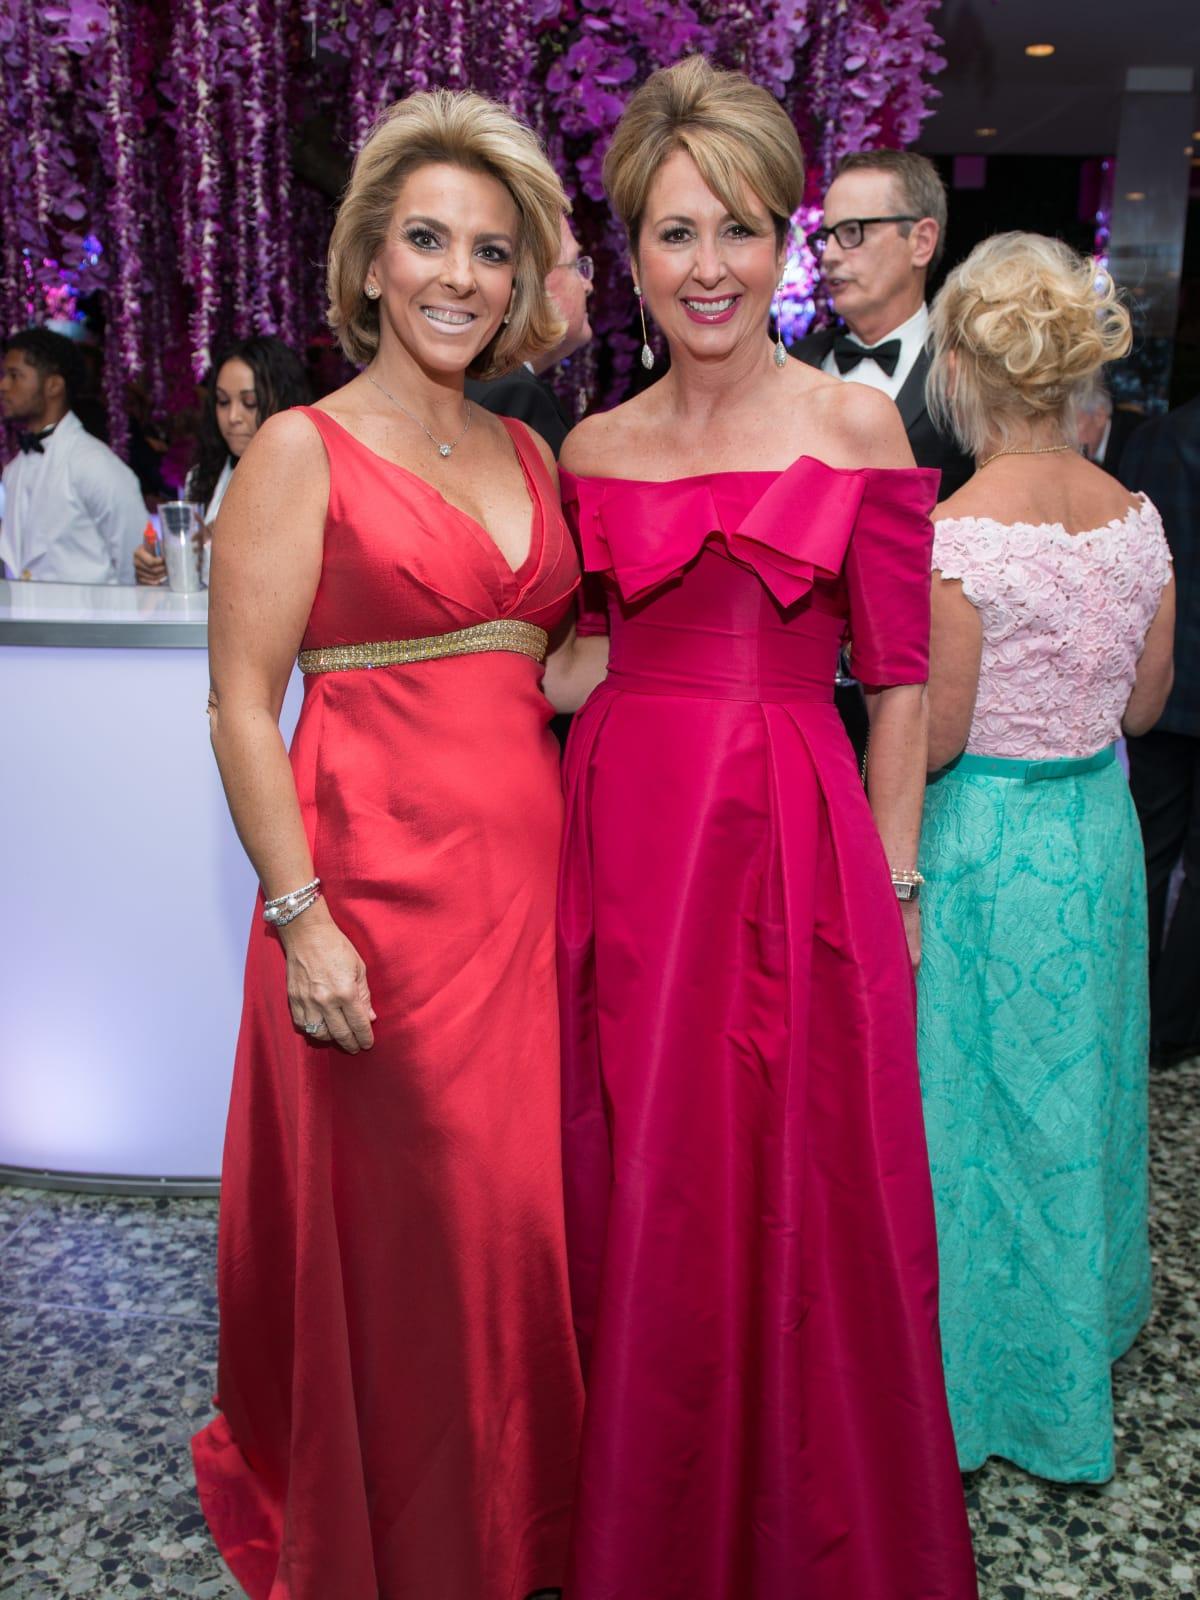 MFAH Grand Gala Ball 2017